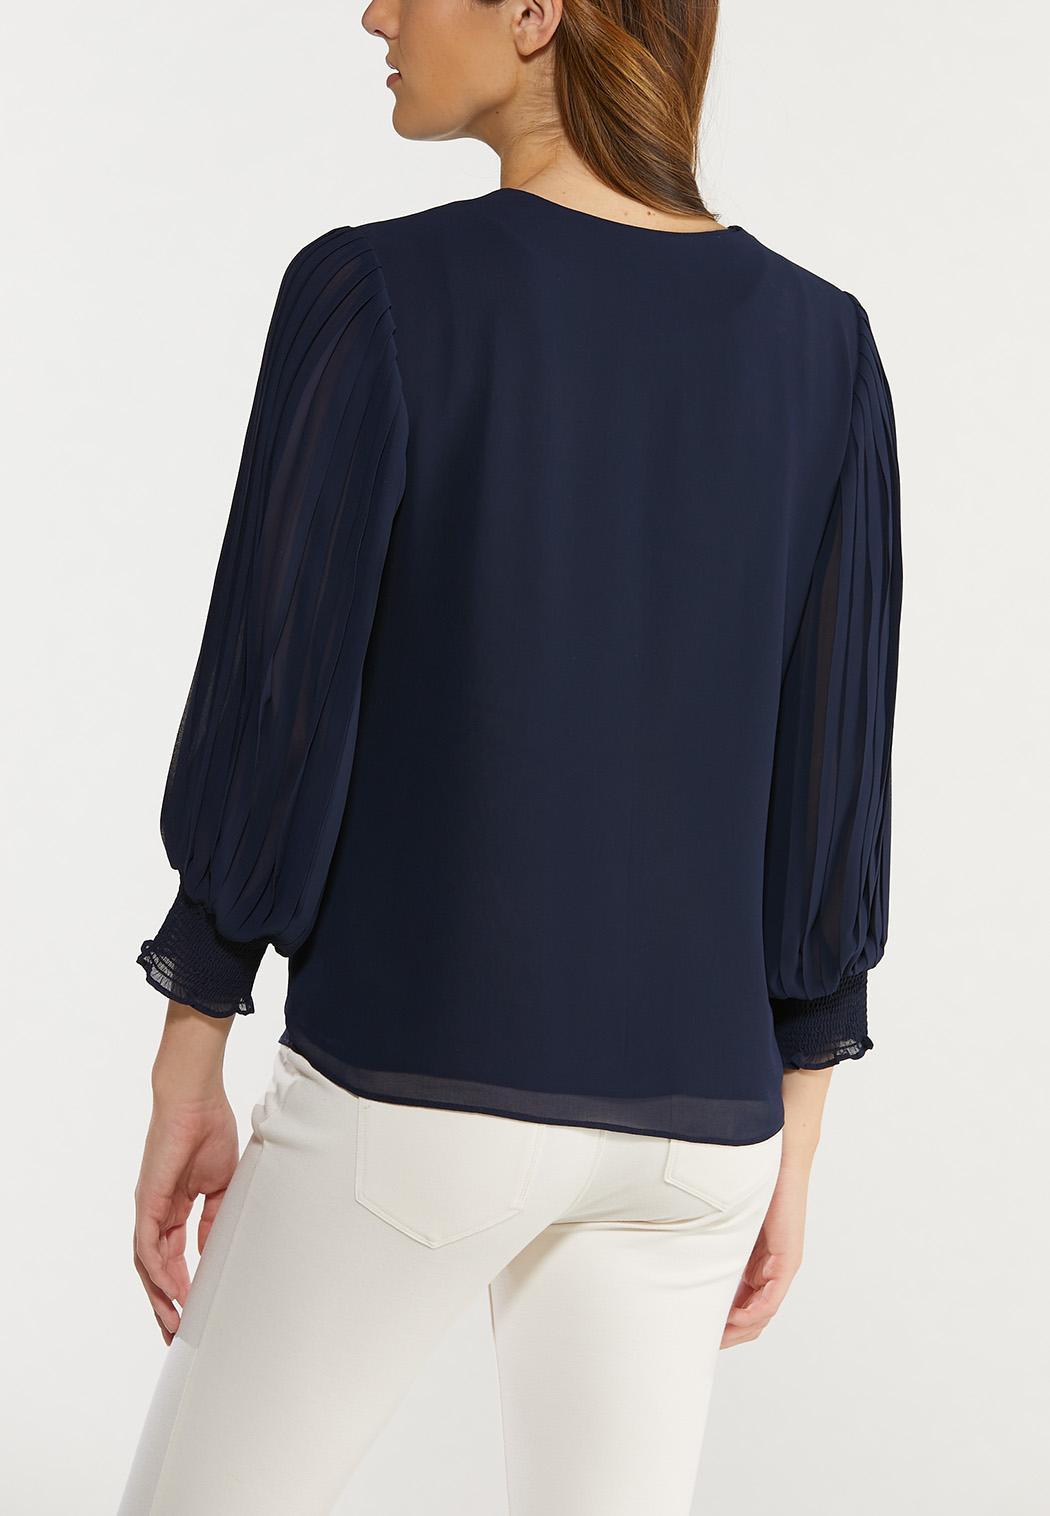 Plus Size Navy Smocked Sleeve Top (Item #44516891)